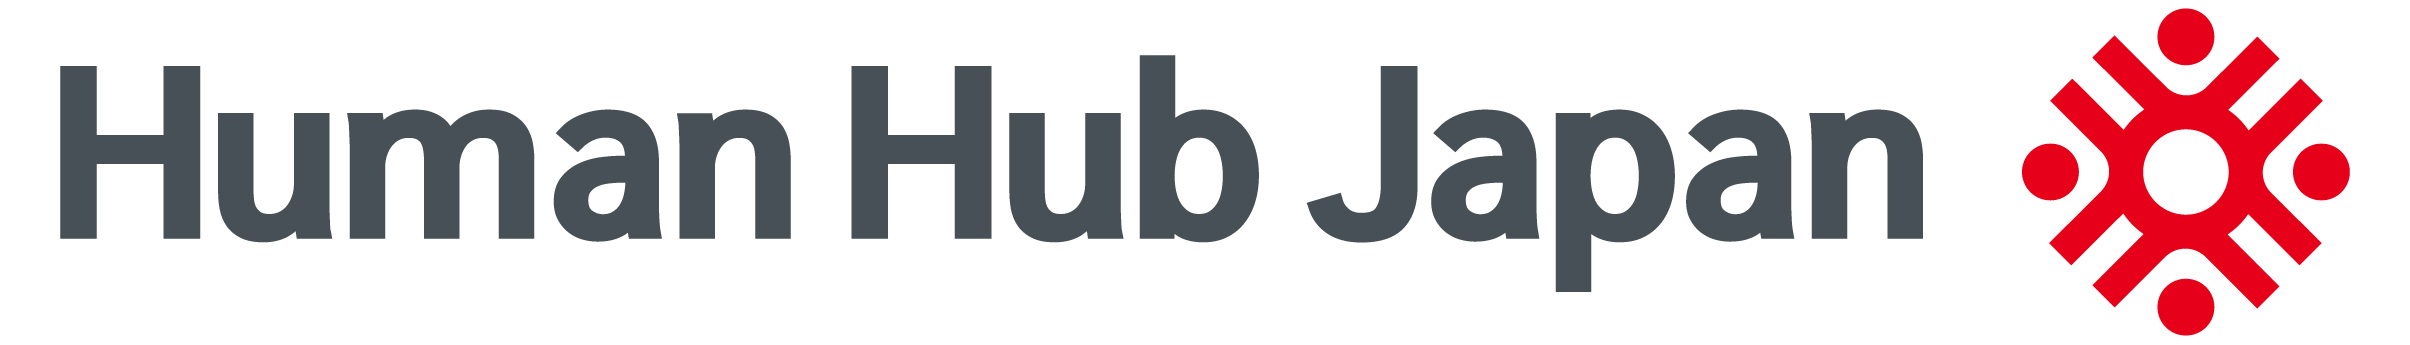 Human Hub Japan